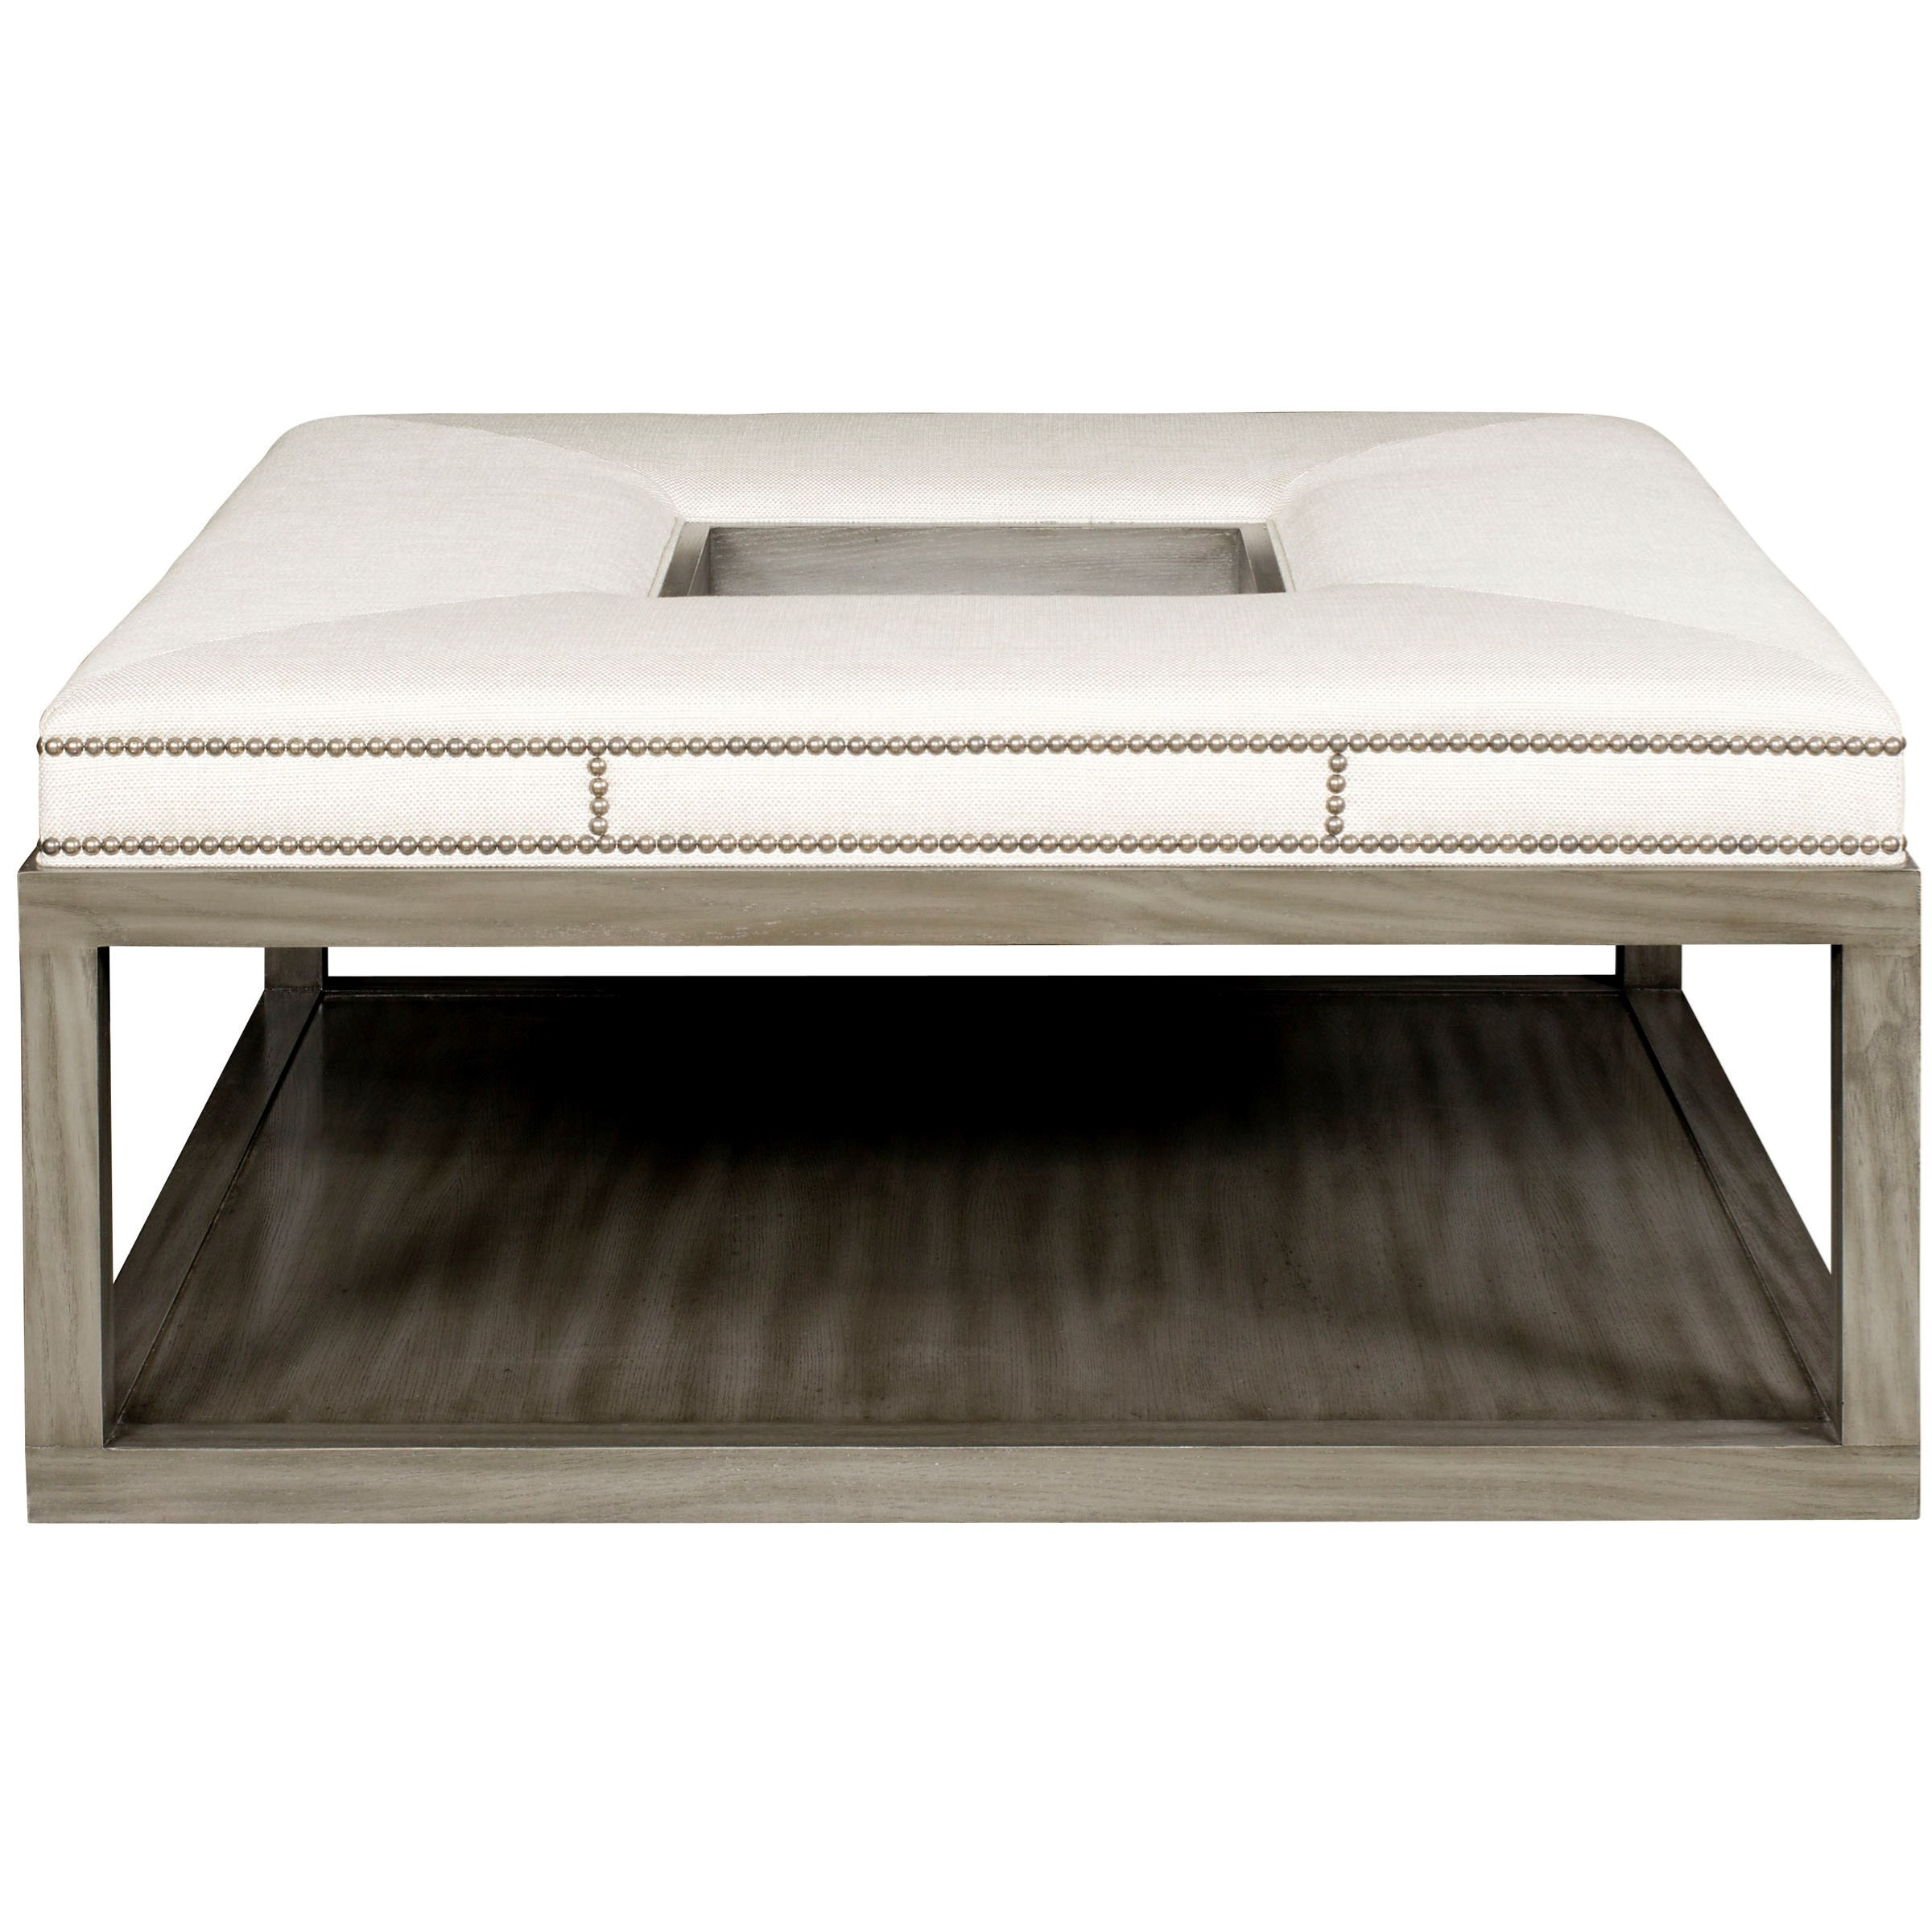 Genial Vanguard Furniture Michael WeissWayland Square Wood Ottoman ...